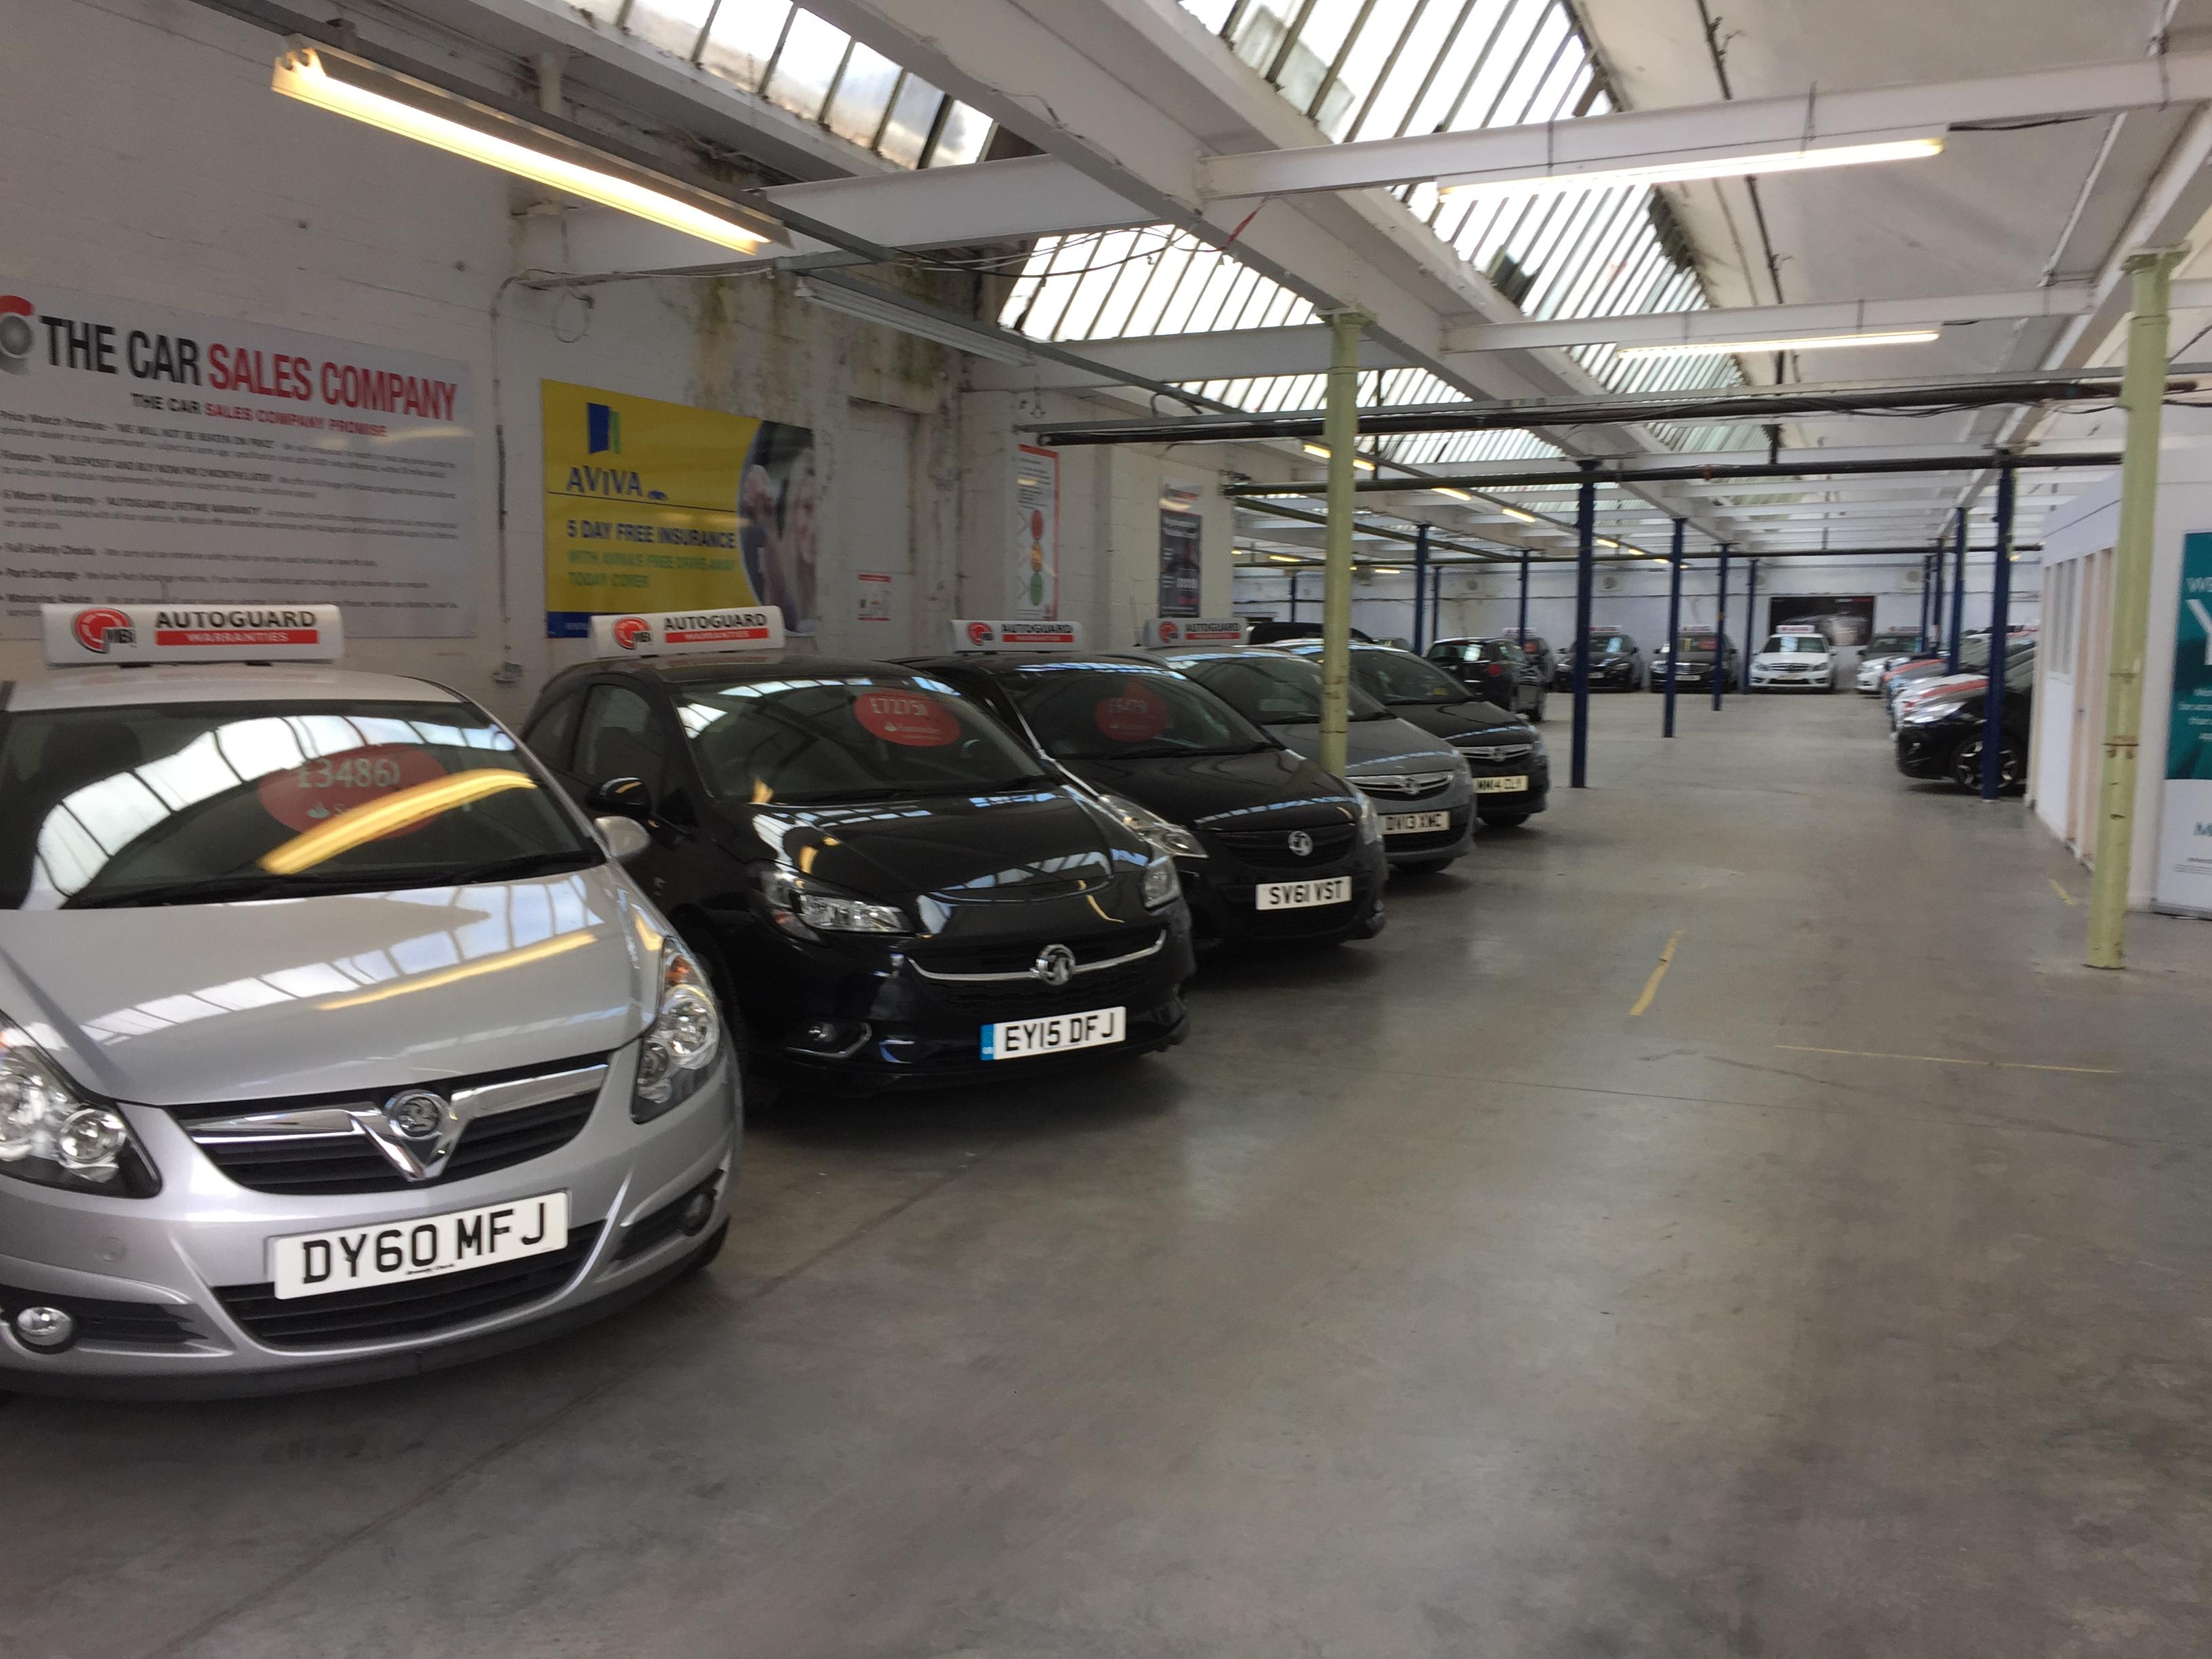 The Car Company >> The Car Sales Company Bury Car Dealer Reviews